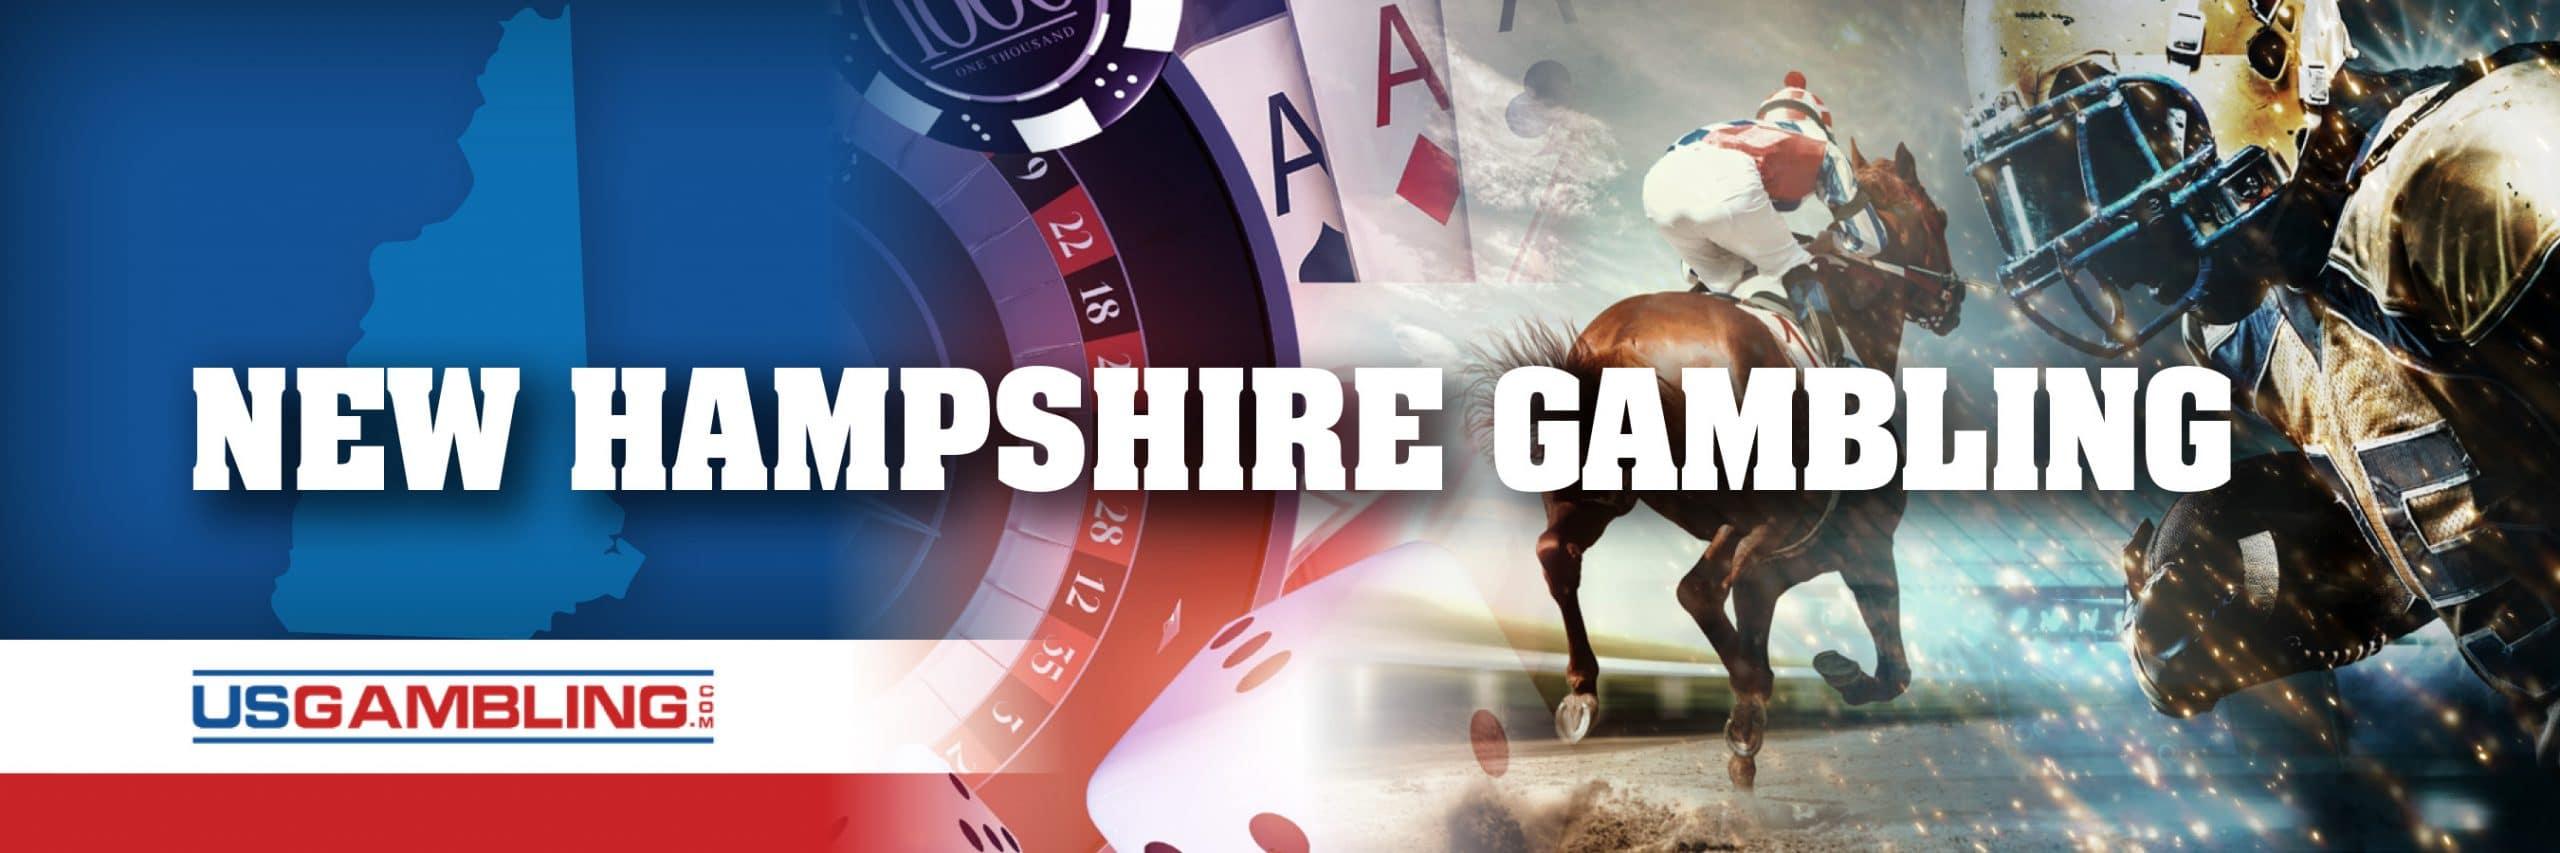 Legal New Hampshire Gambling